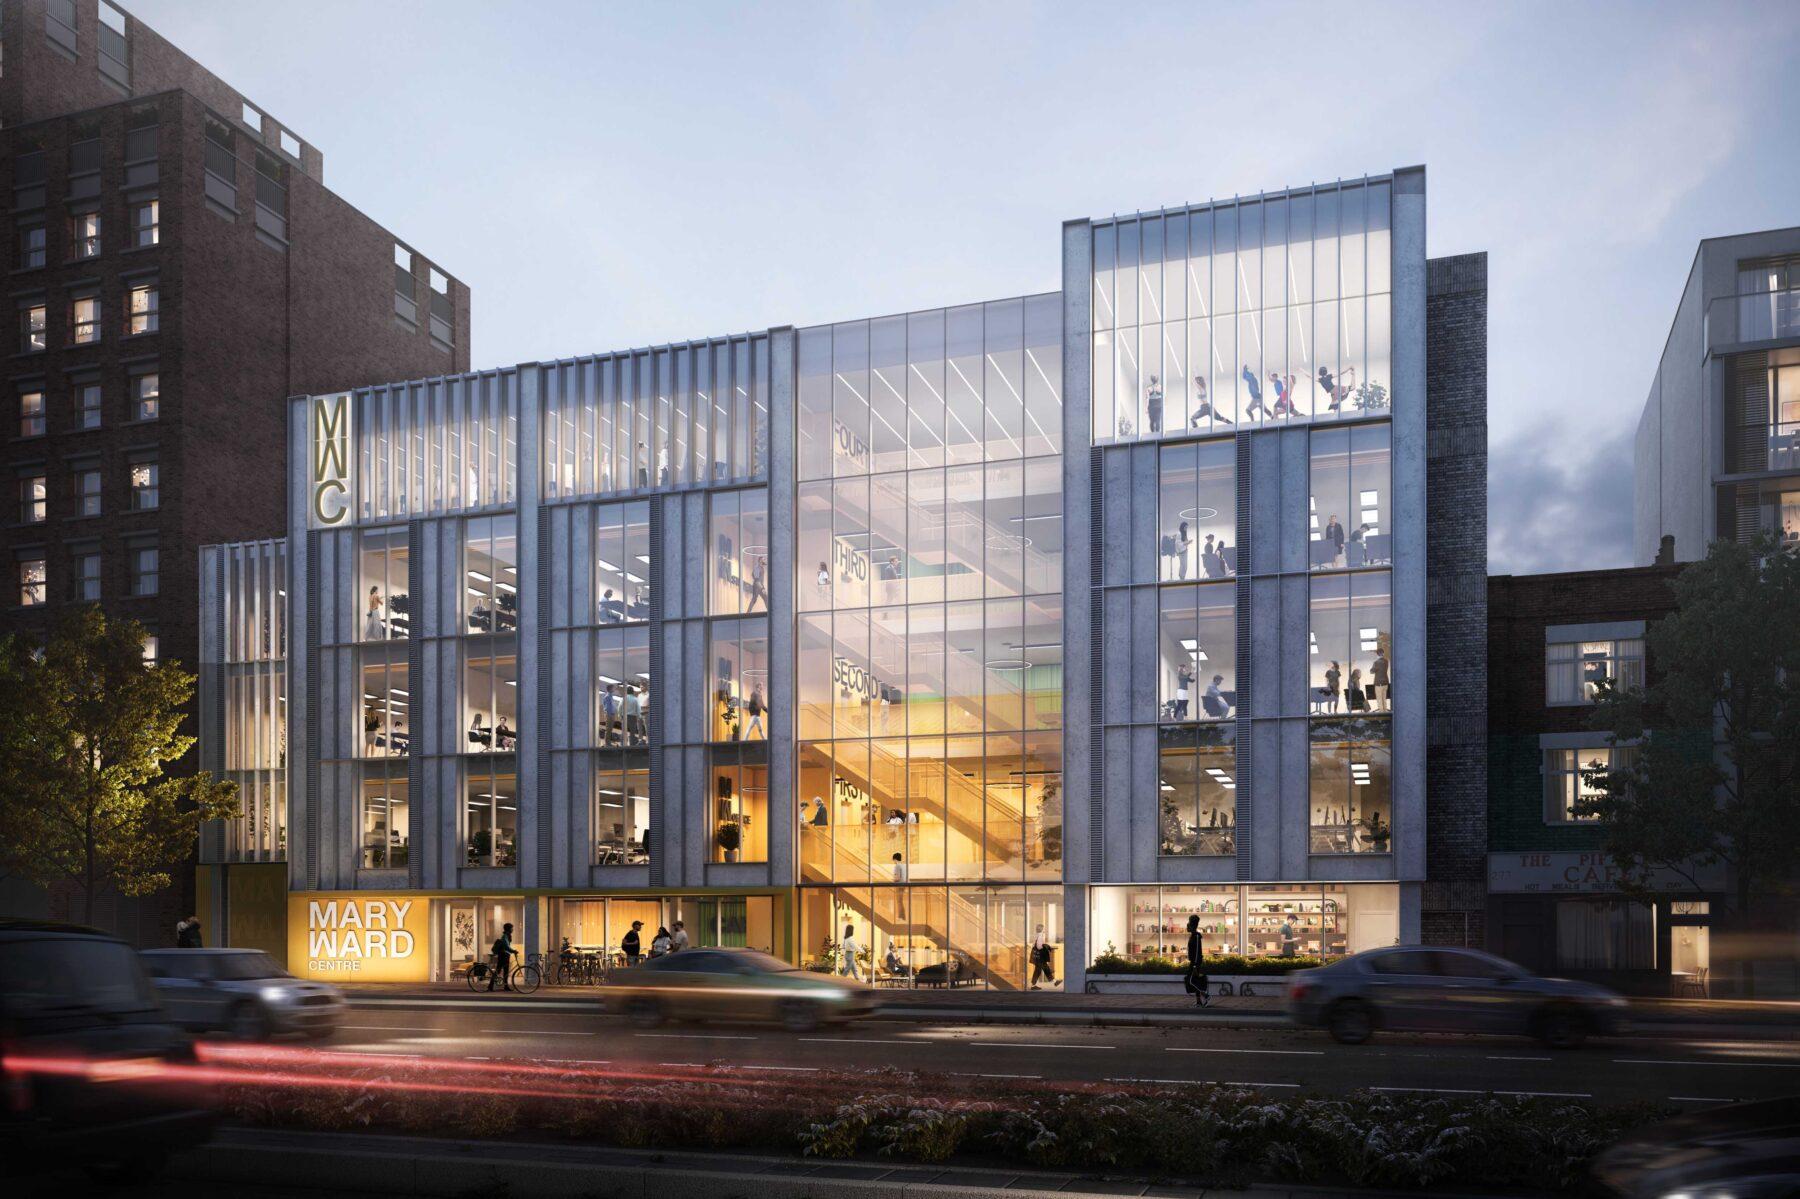 CGI facade of the Mary Ward centre at night